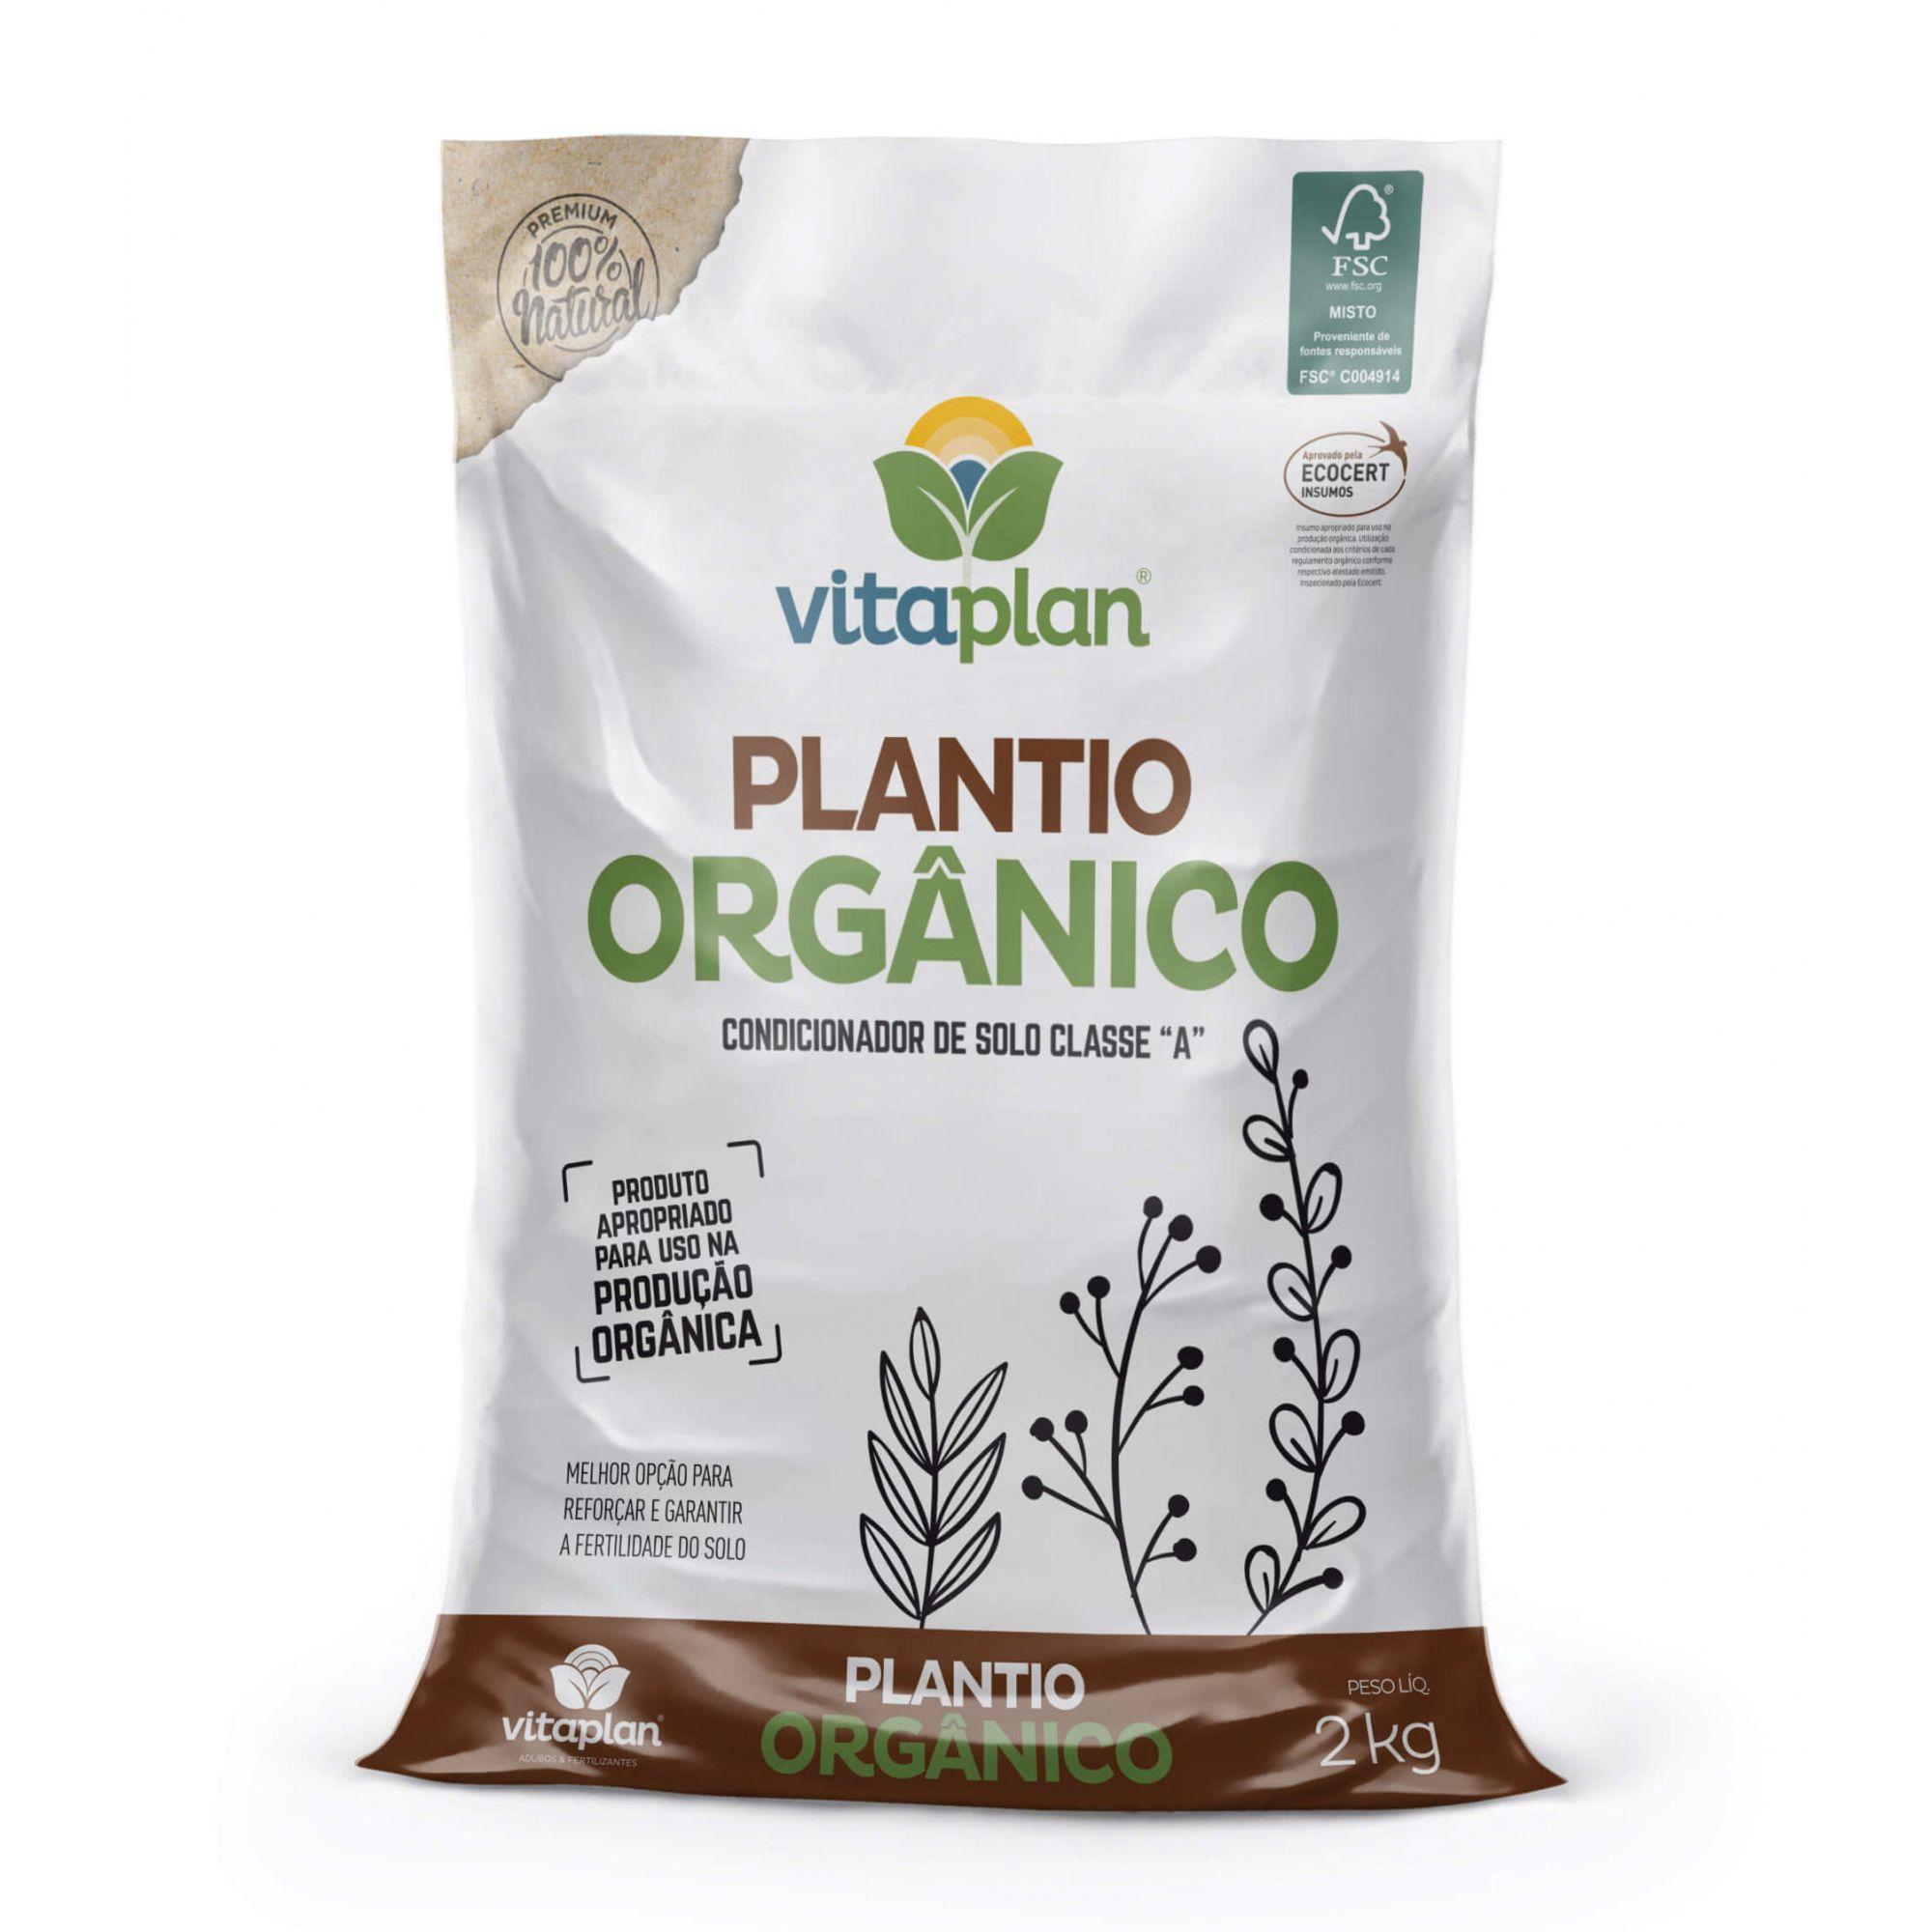 Condicionador de Solo para Plantio Orgânico 2kg - Vitaplan